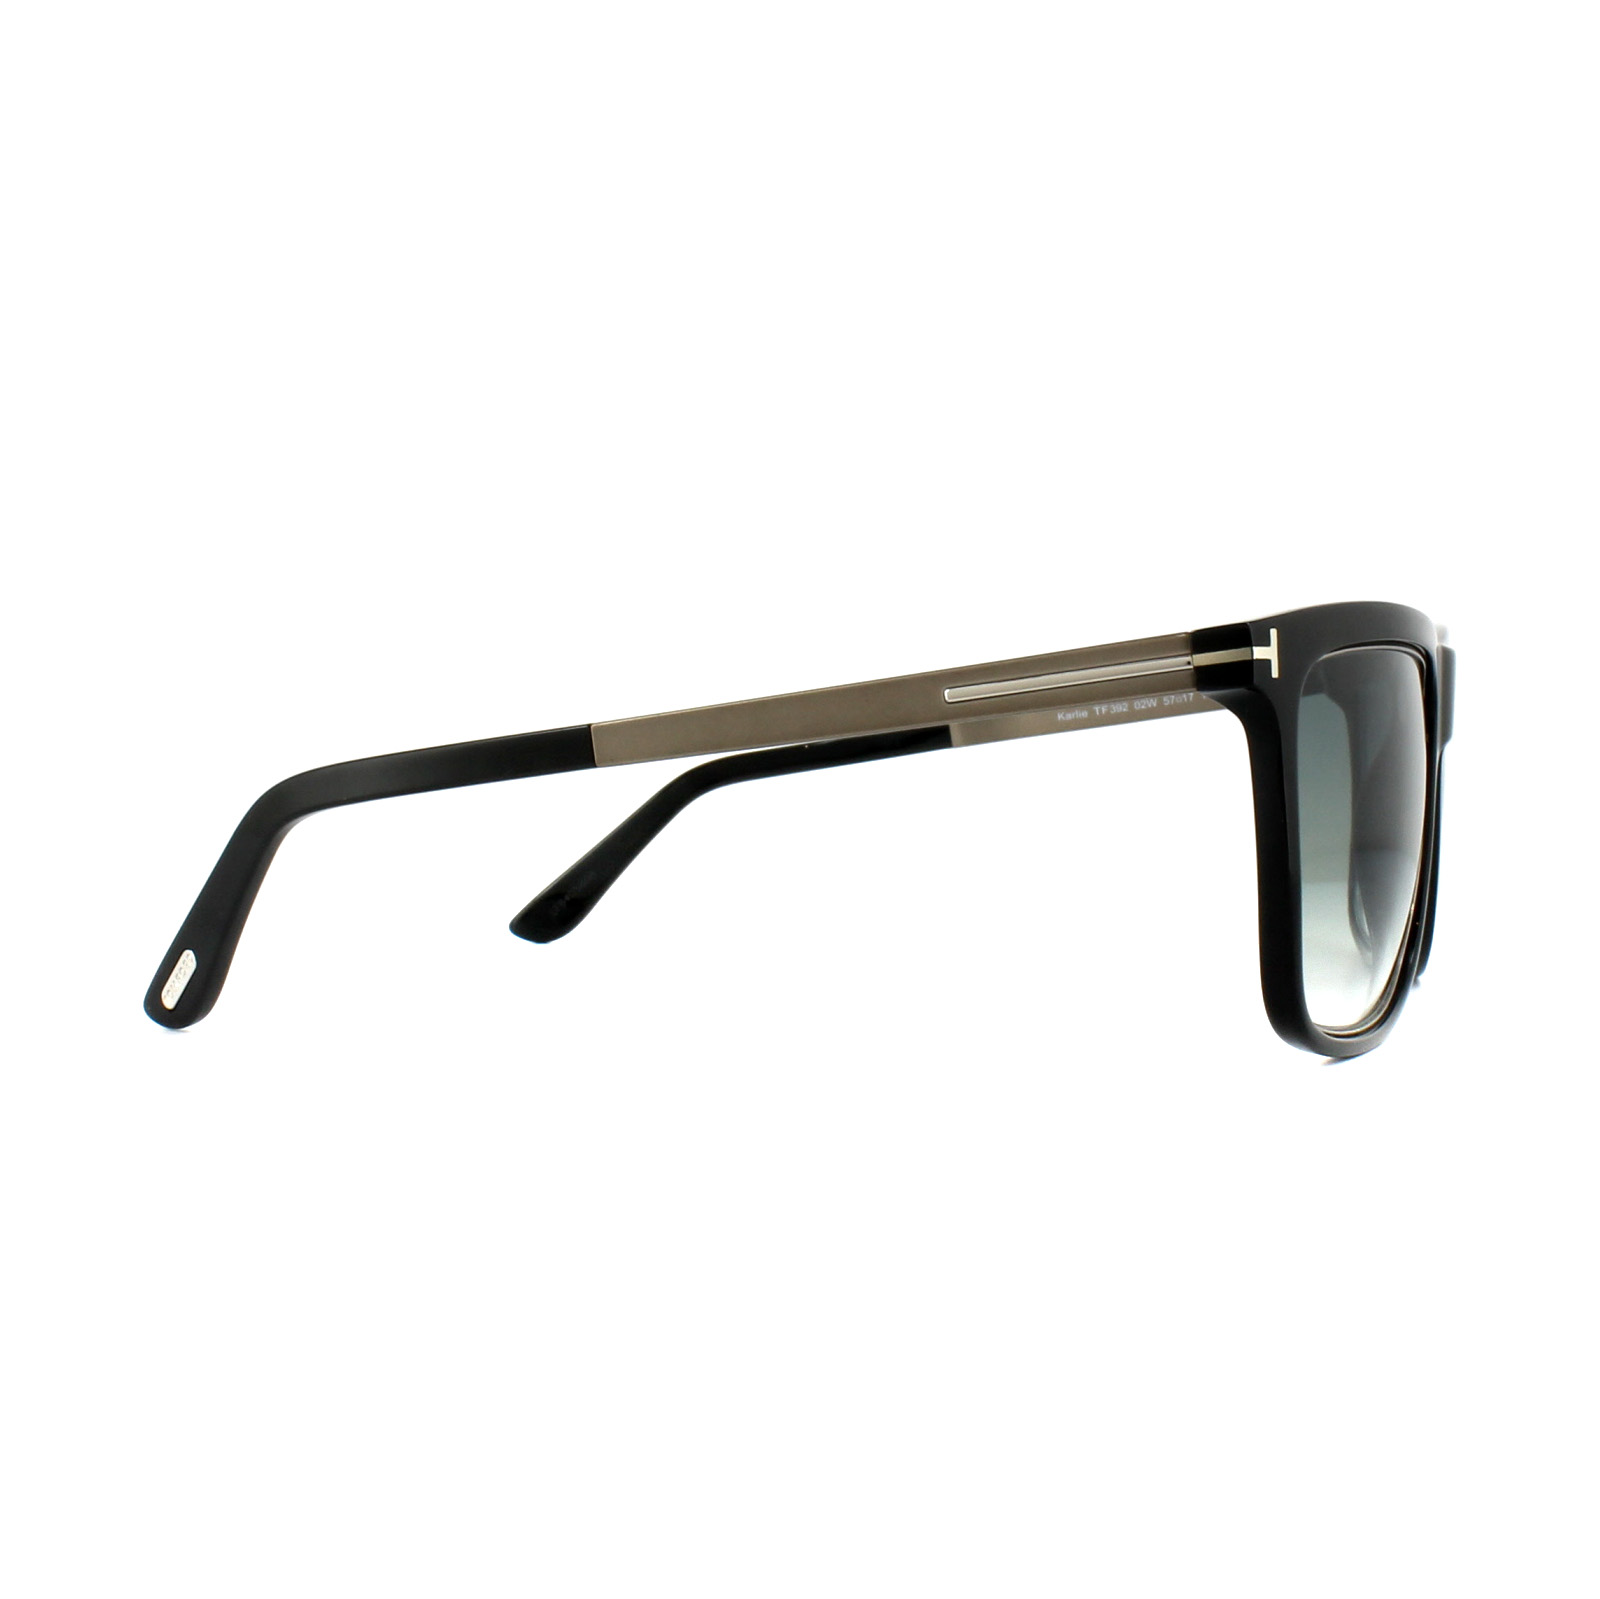 102ff9d23d Tom Ford Sunglasses 0392 Karlie 02W Black Blue Gradient 664689655137 ...